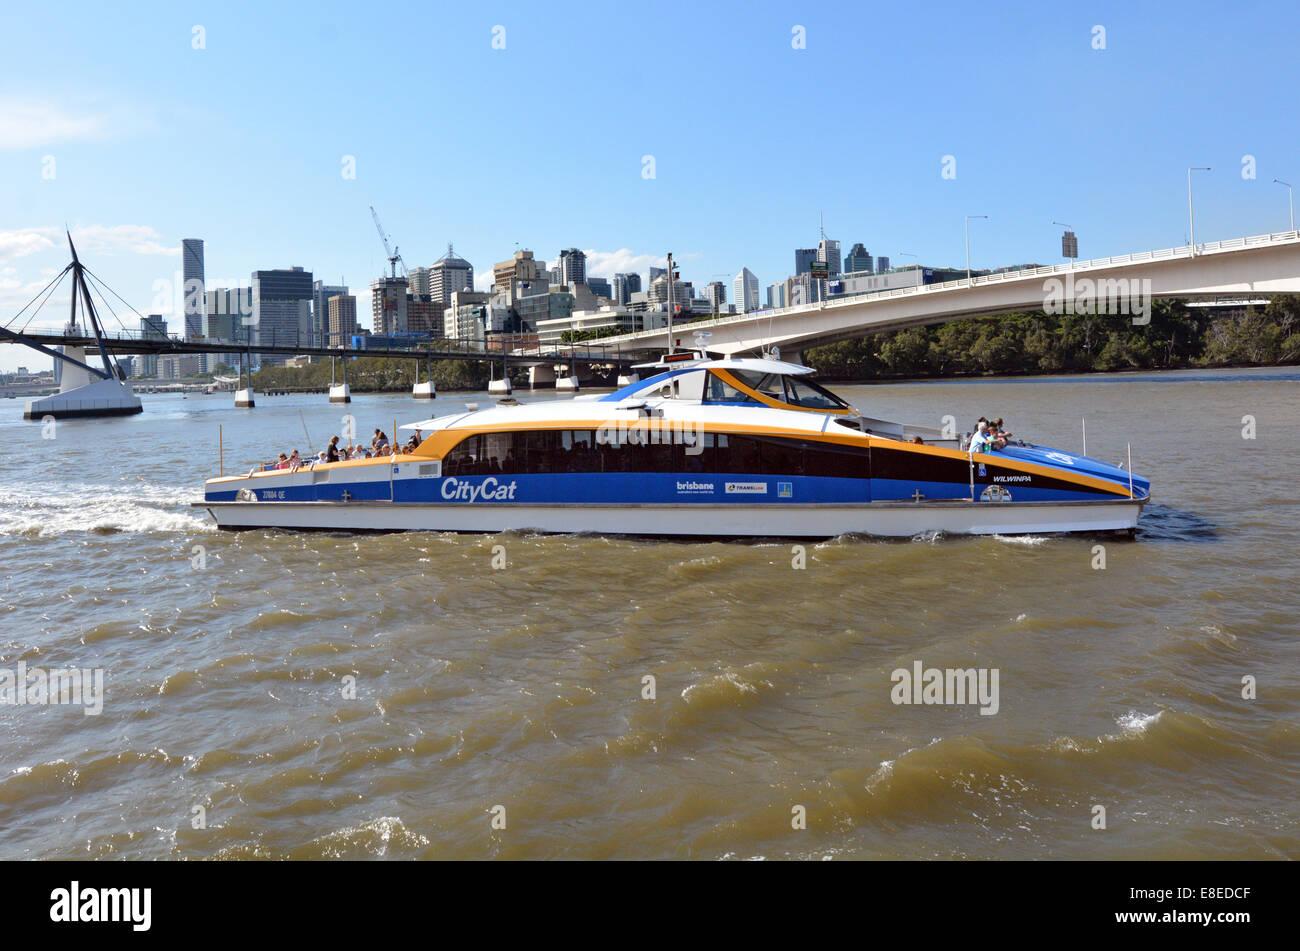 CityCat and ferry service in Brisbane, Australia. - Stock Image